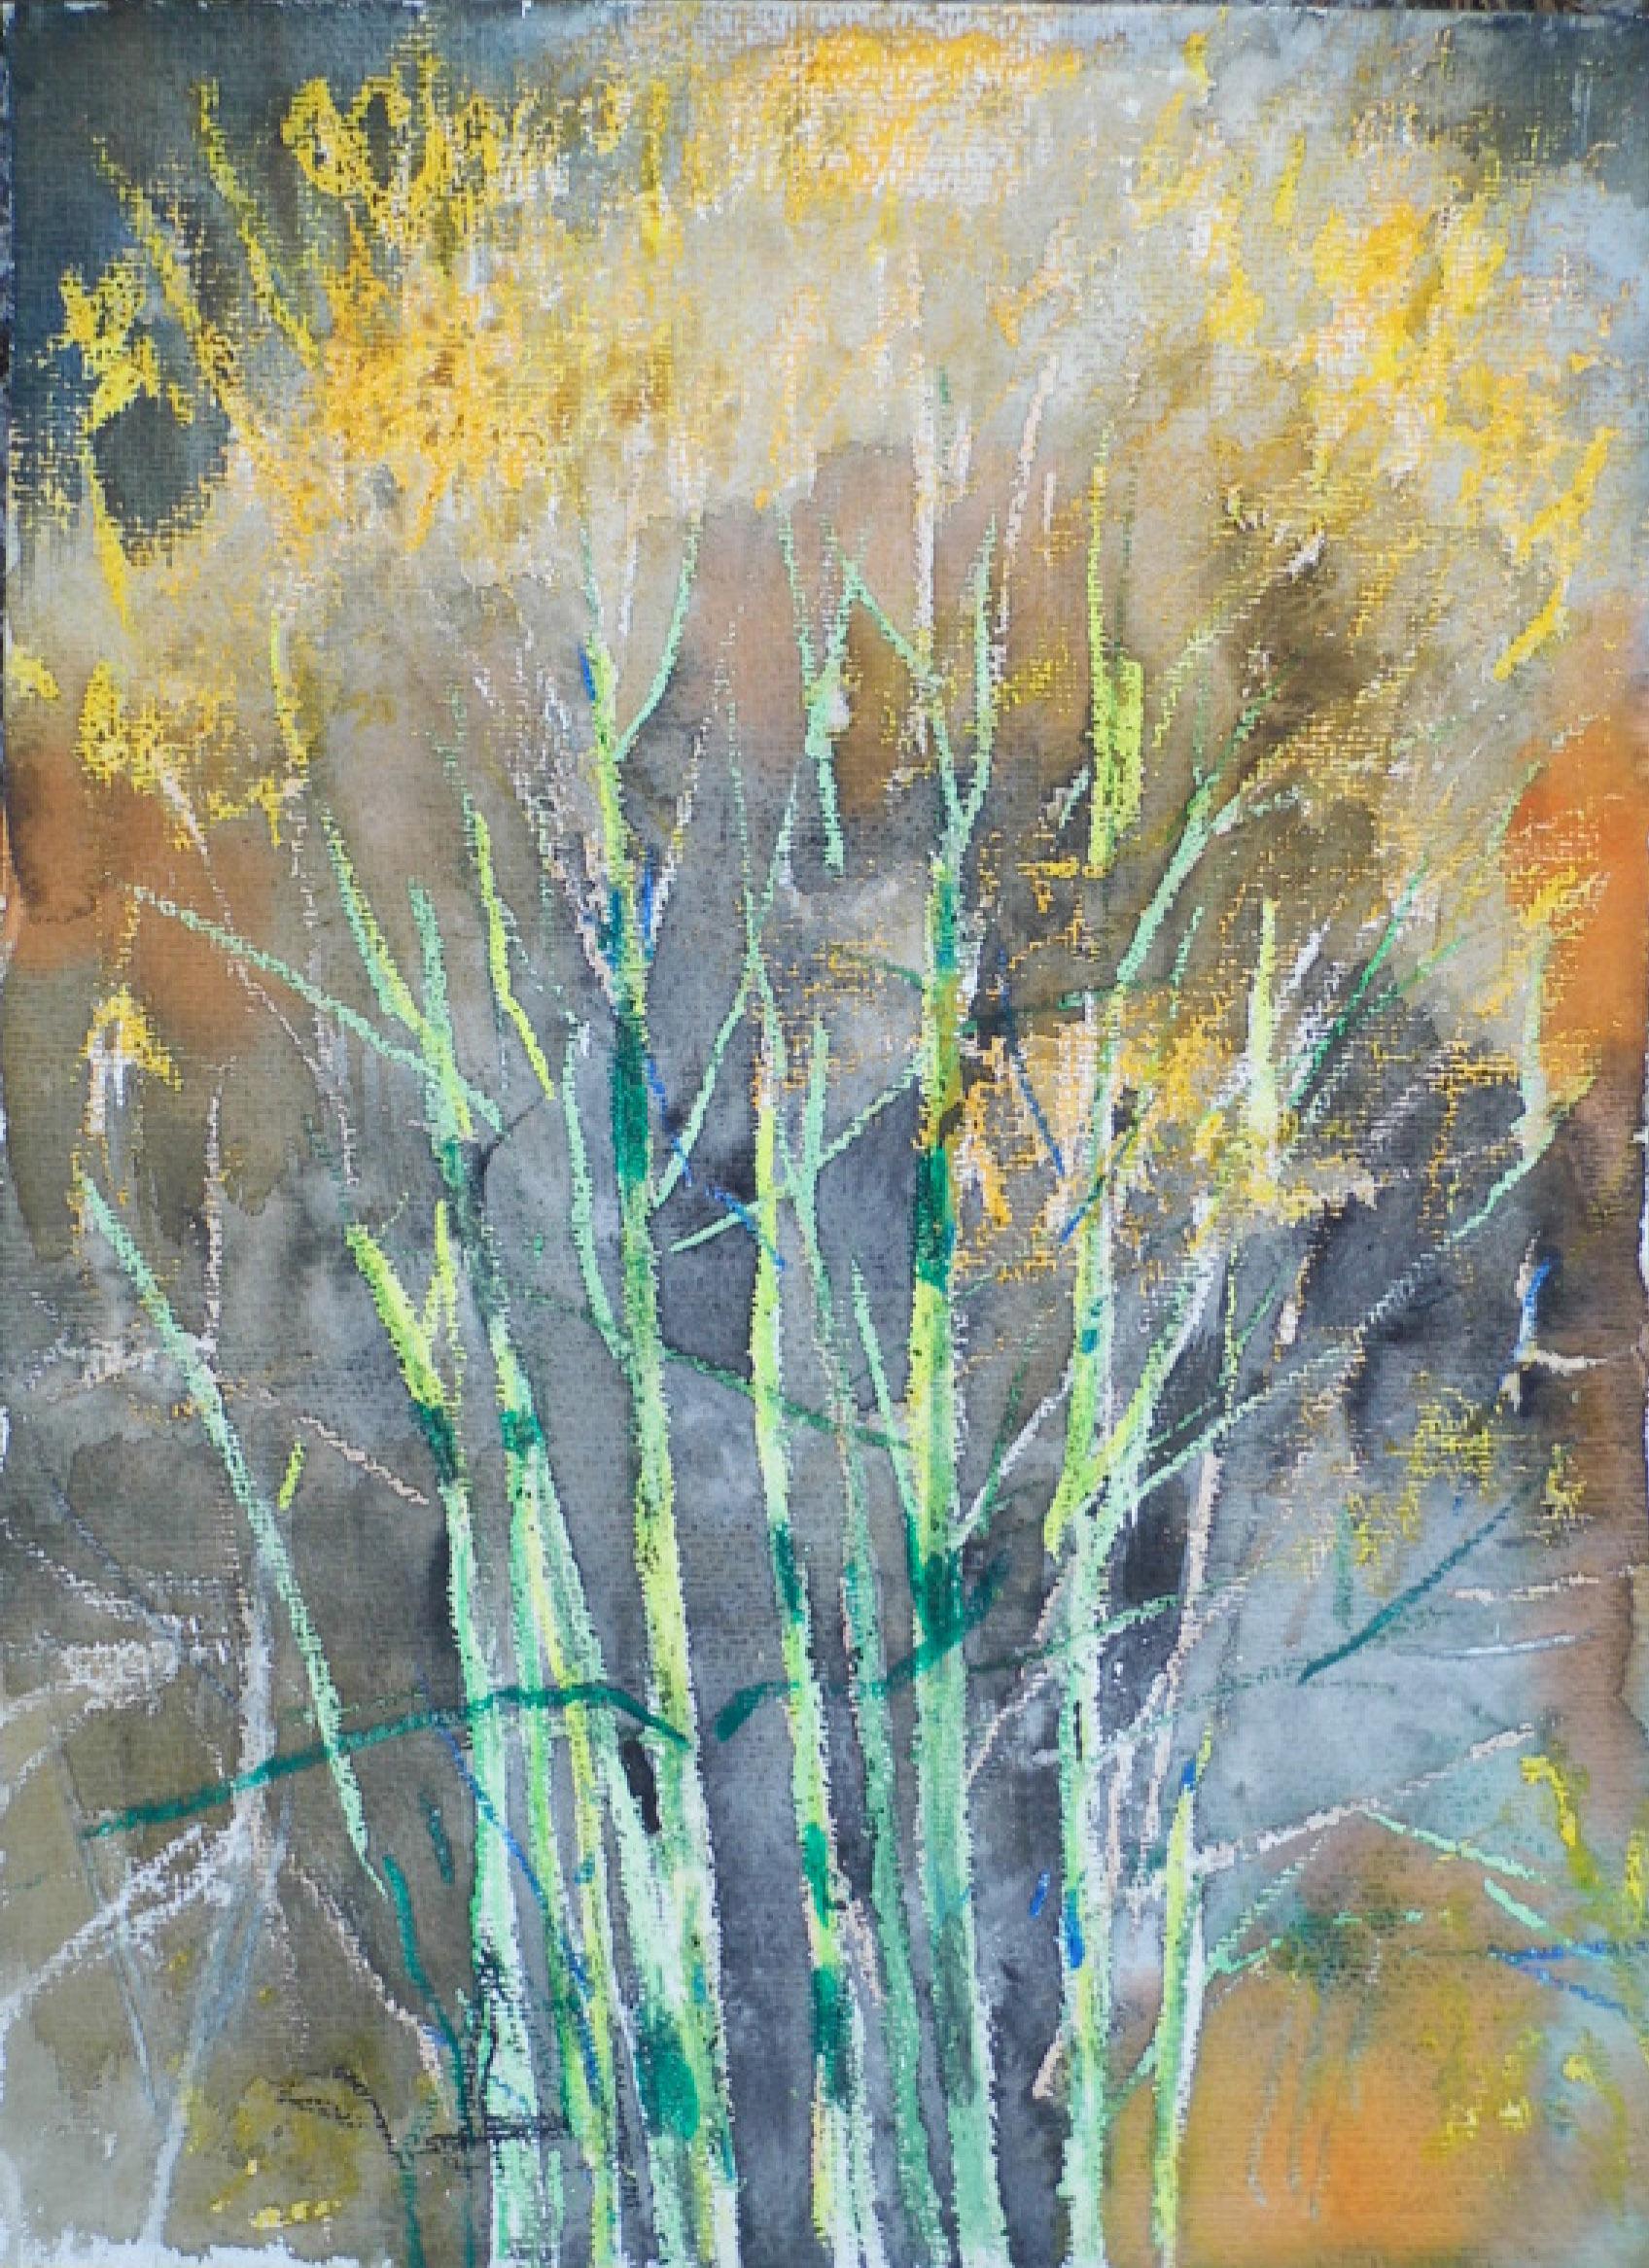 8 | Rita Geißler | 2017 | Aquarell/Ölpastell | 40 x 30 cm | Kunstlotterie